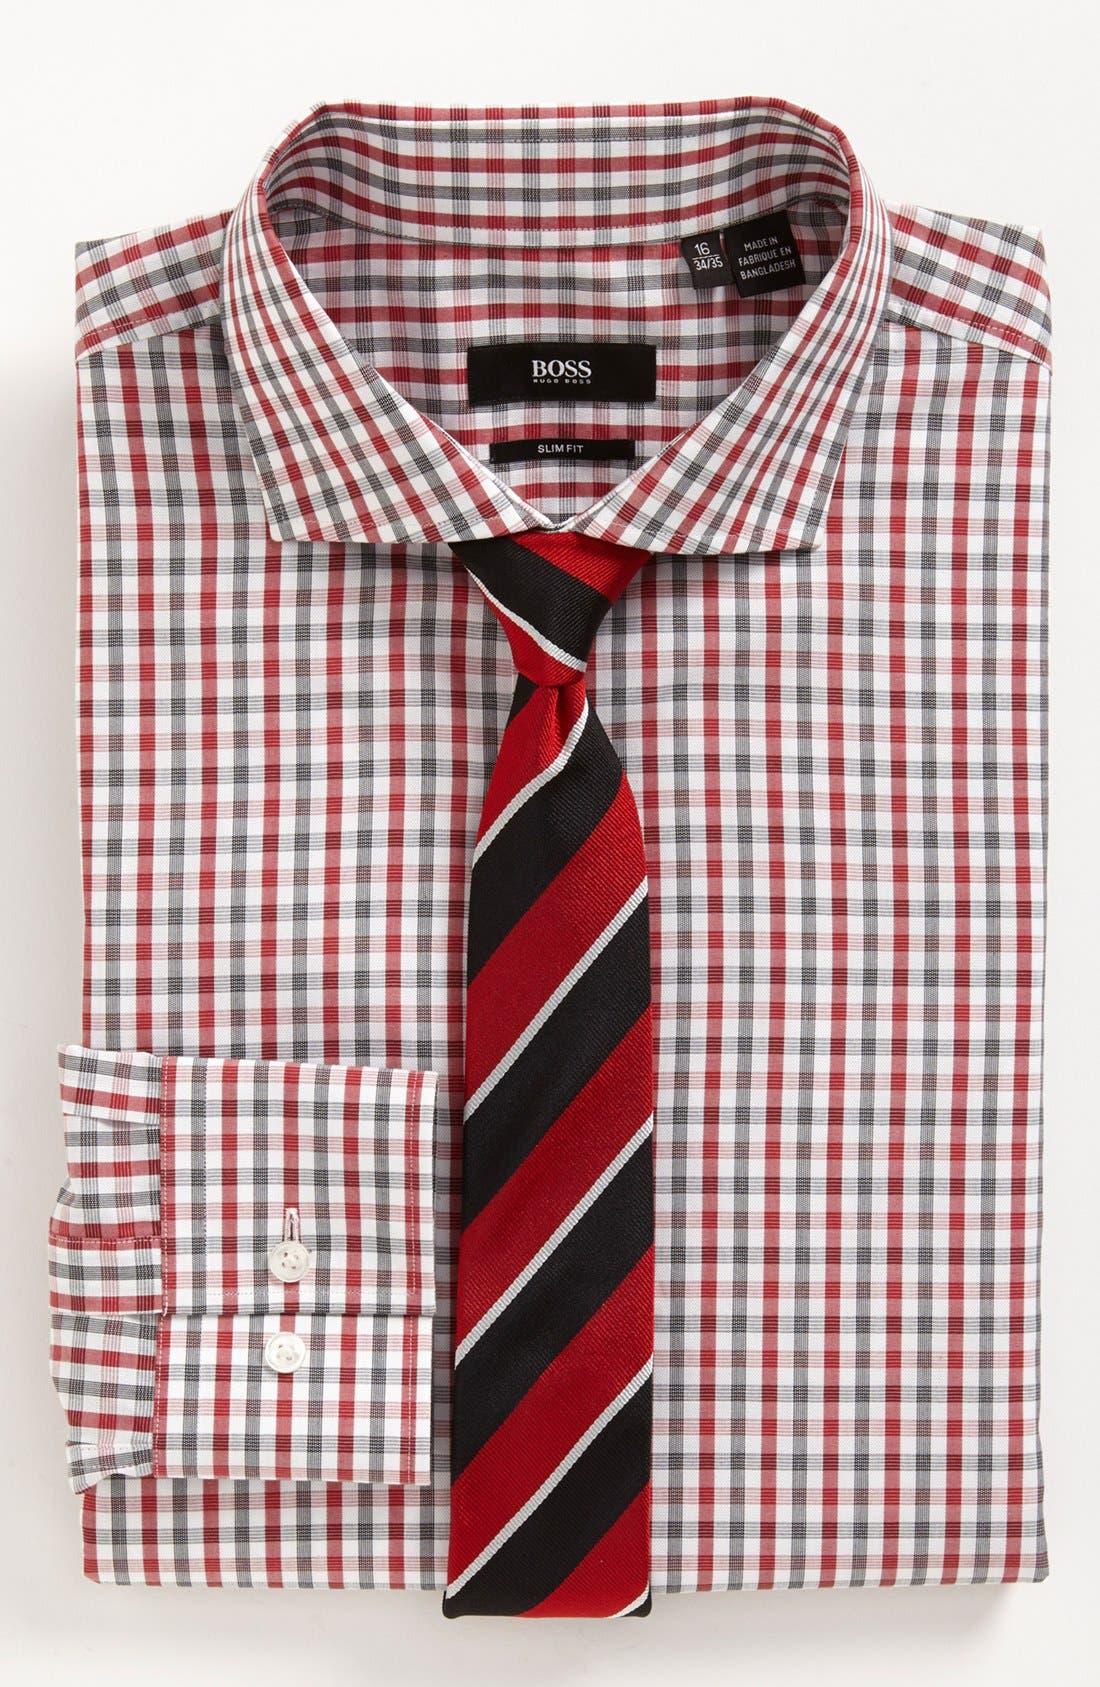 BOSS Black Dress Shirt & Tie,                             Main thumbnail 1, color,                             620